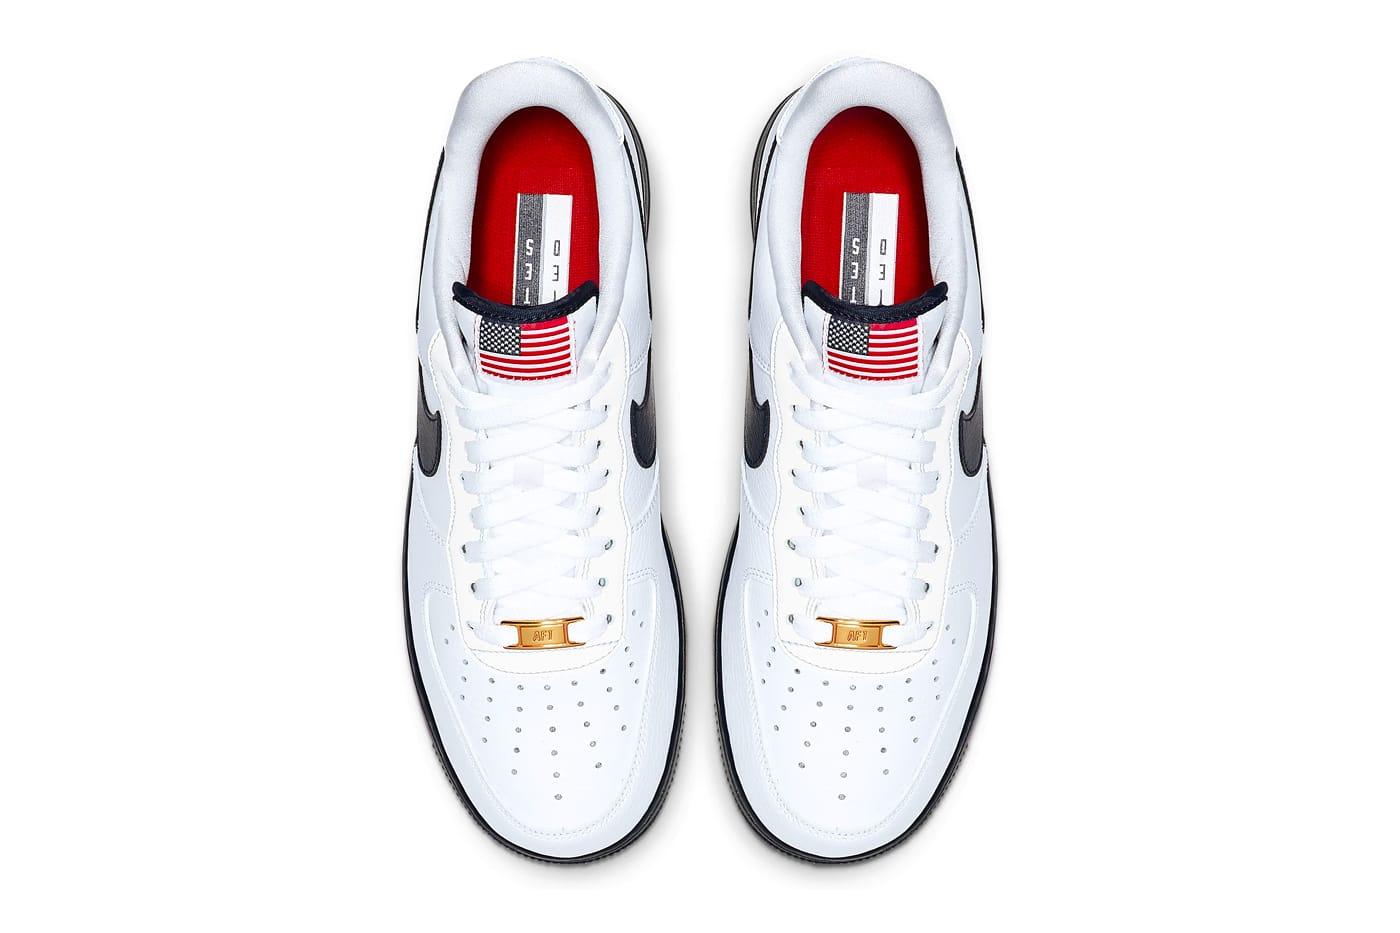 Nike Air Force 1 '07 LV8 USA Flag